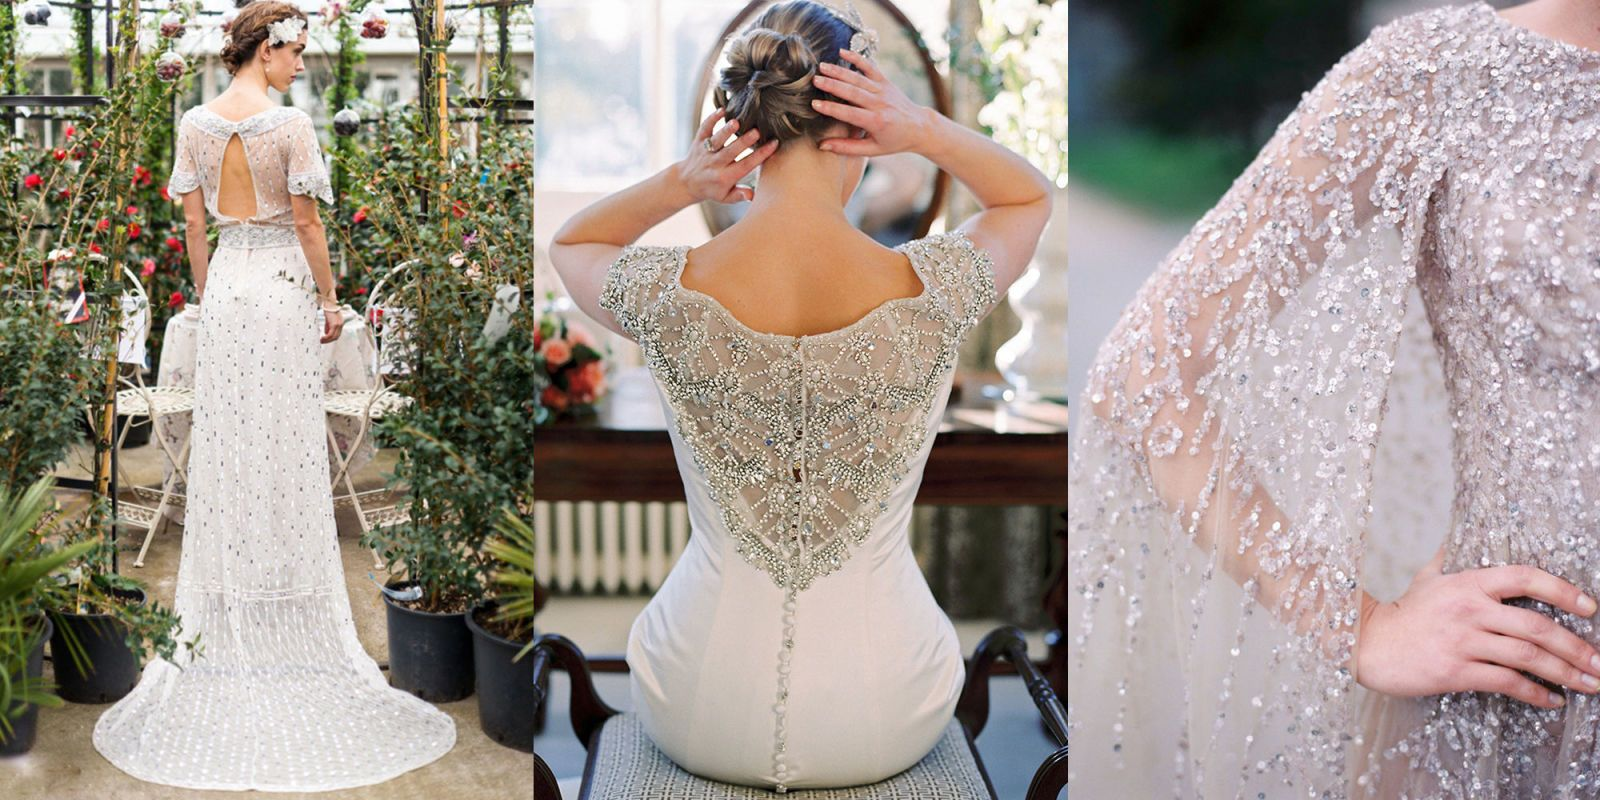 32 Bedazzled Wedding Dresses